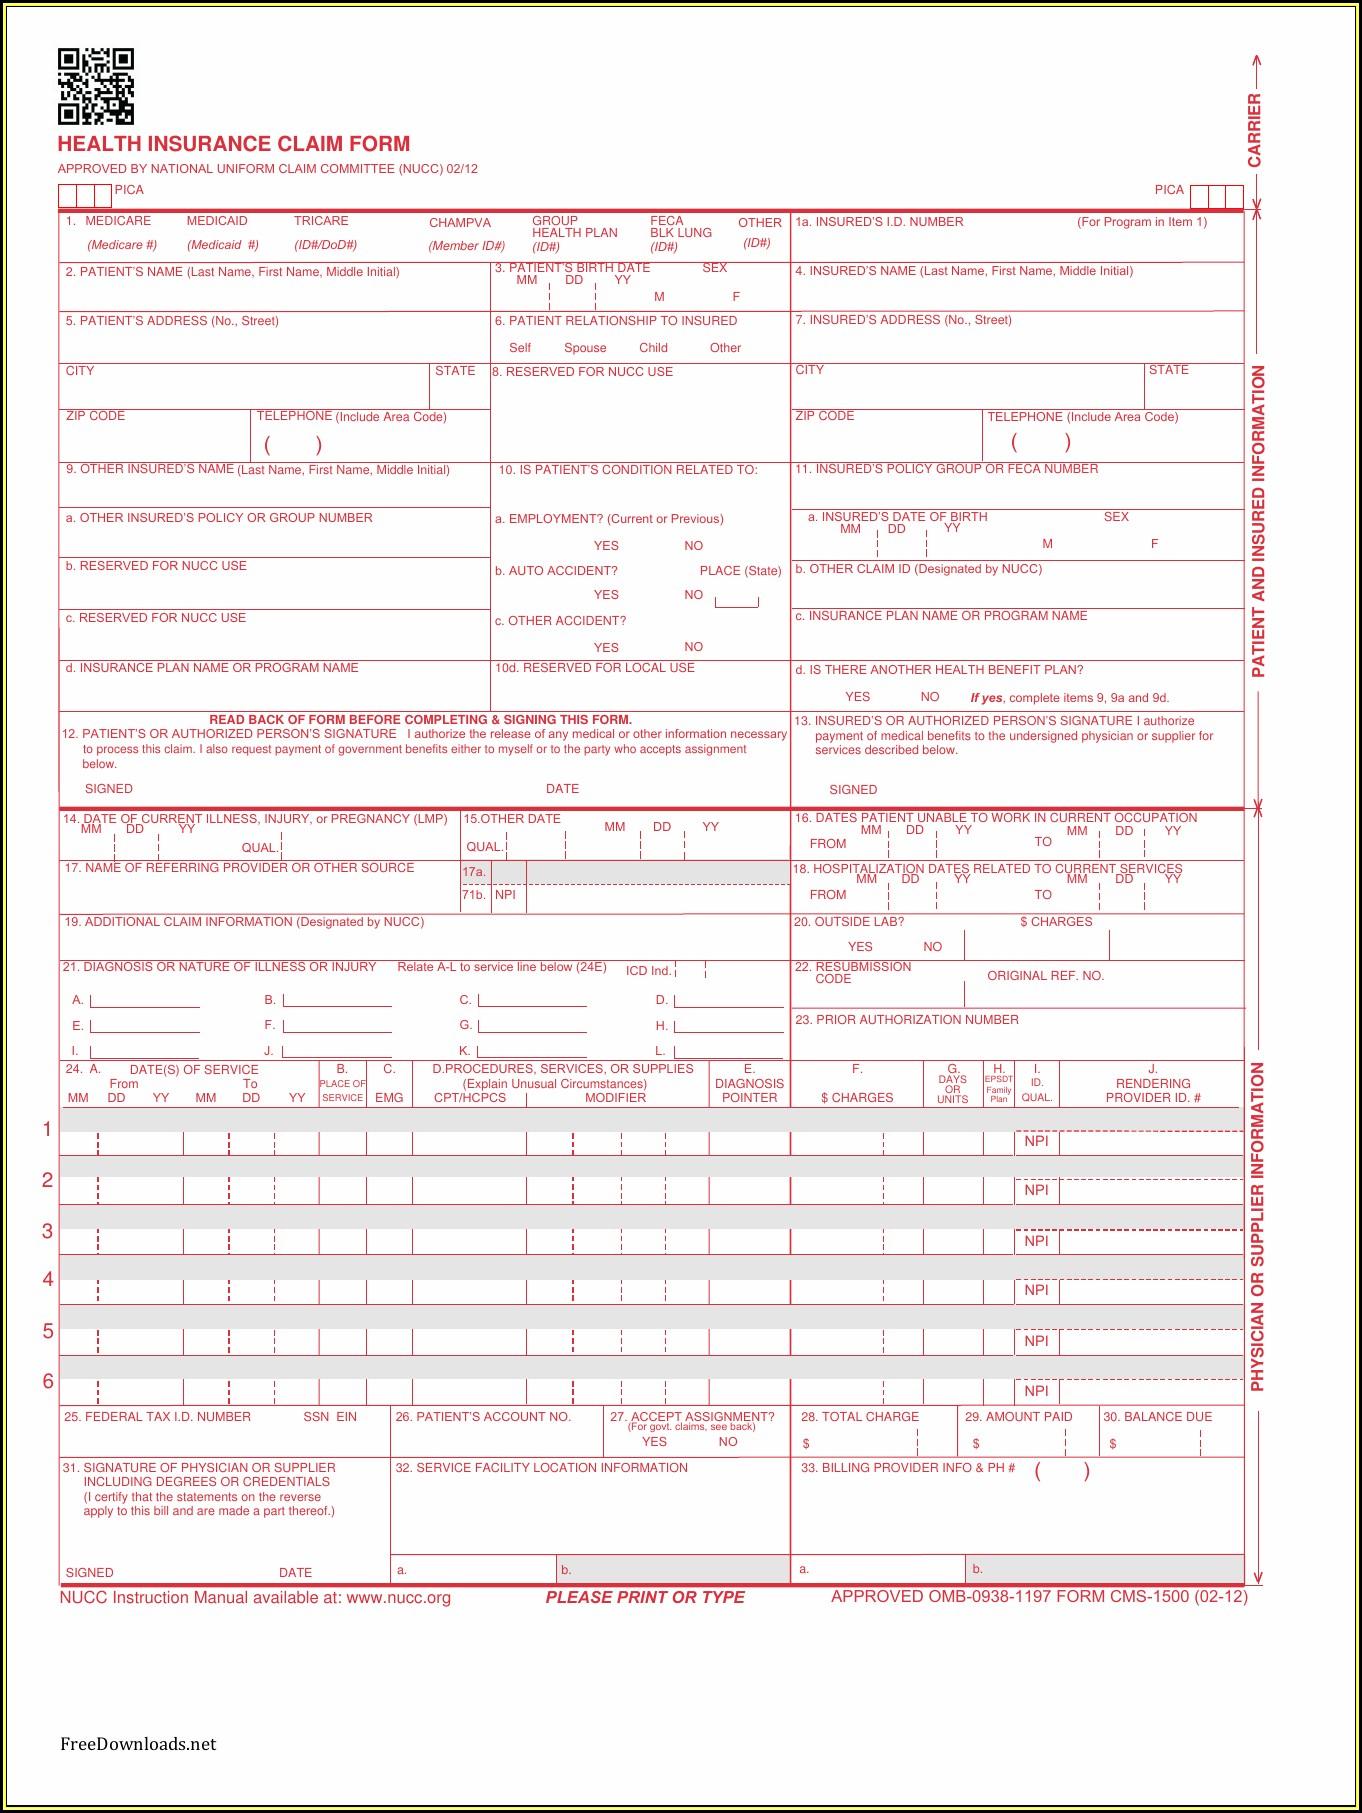 Form Cms 1500 Pdf